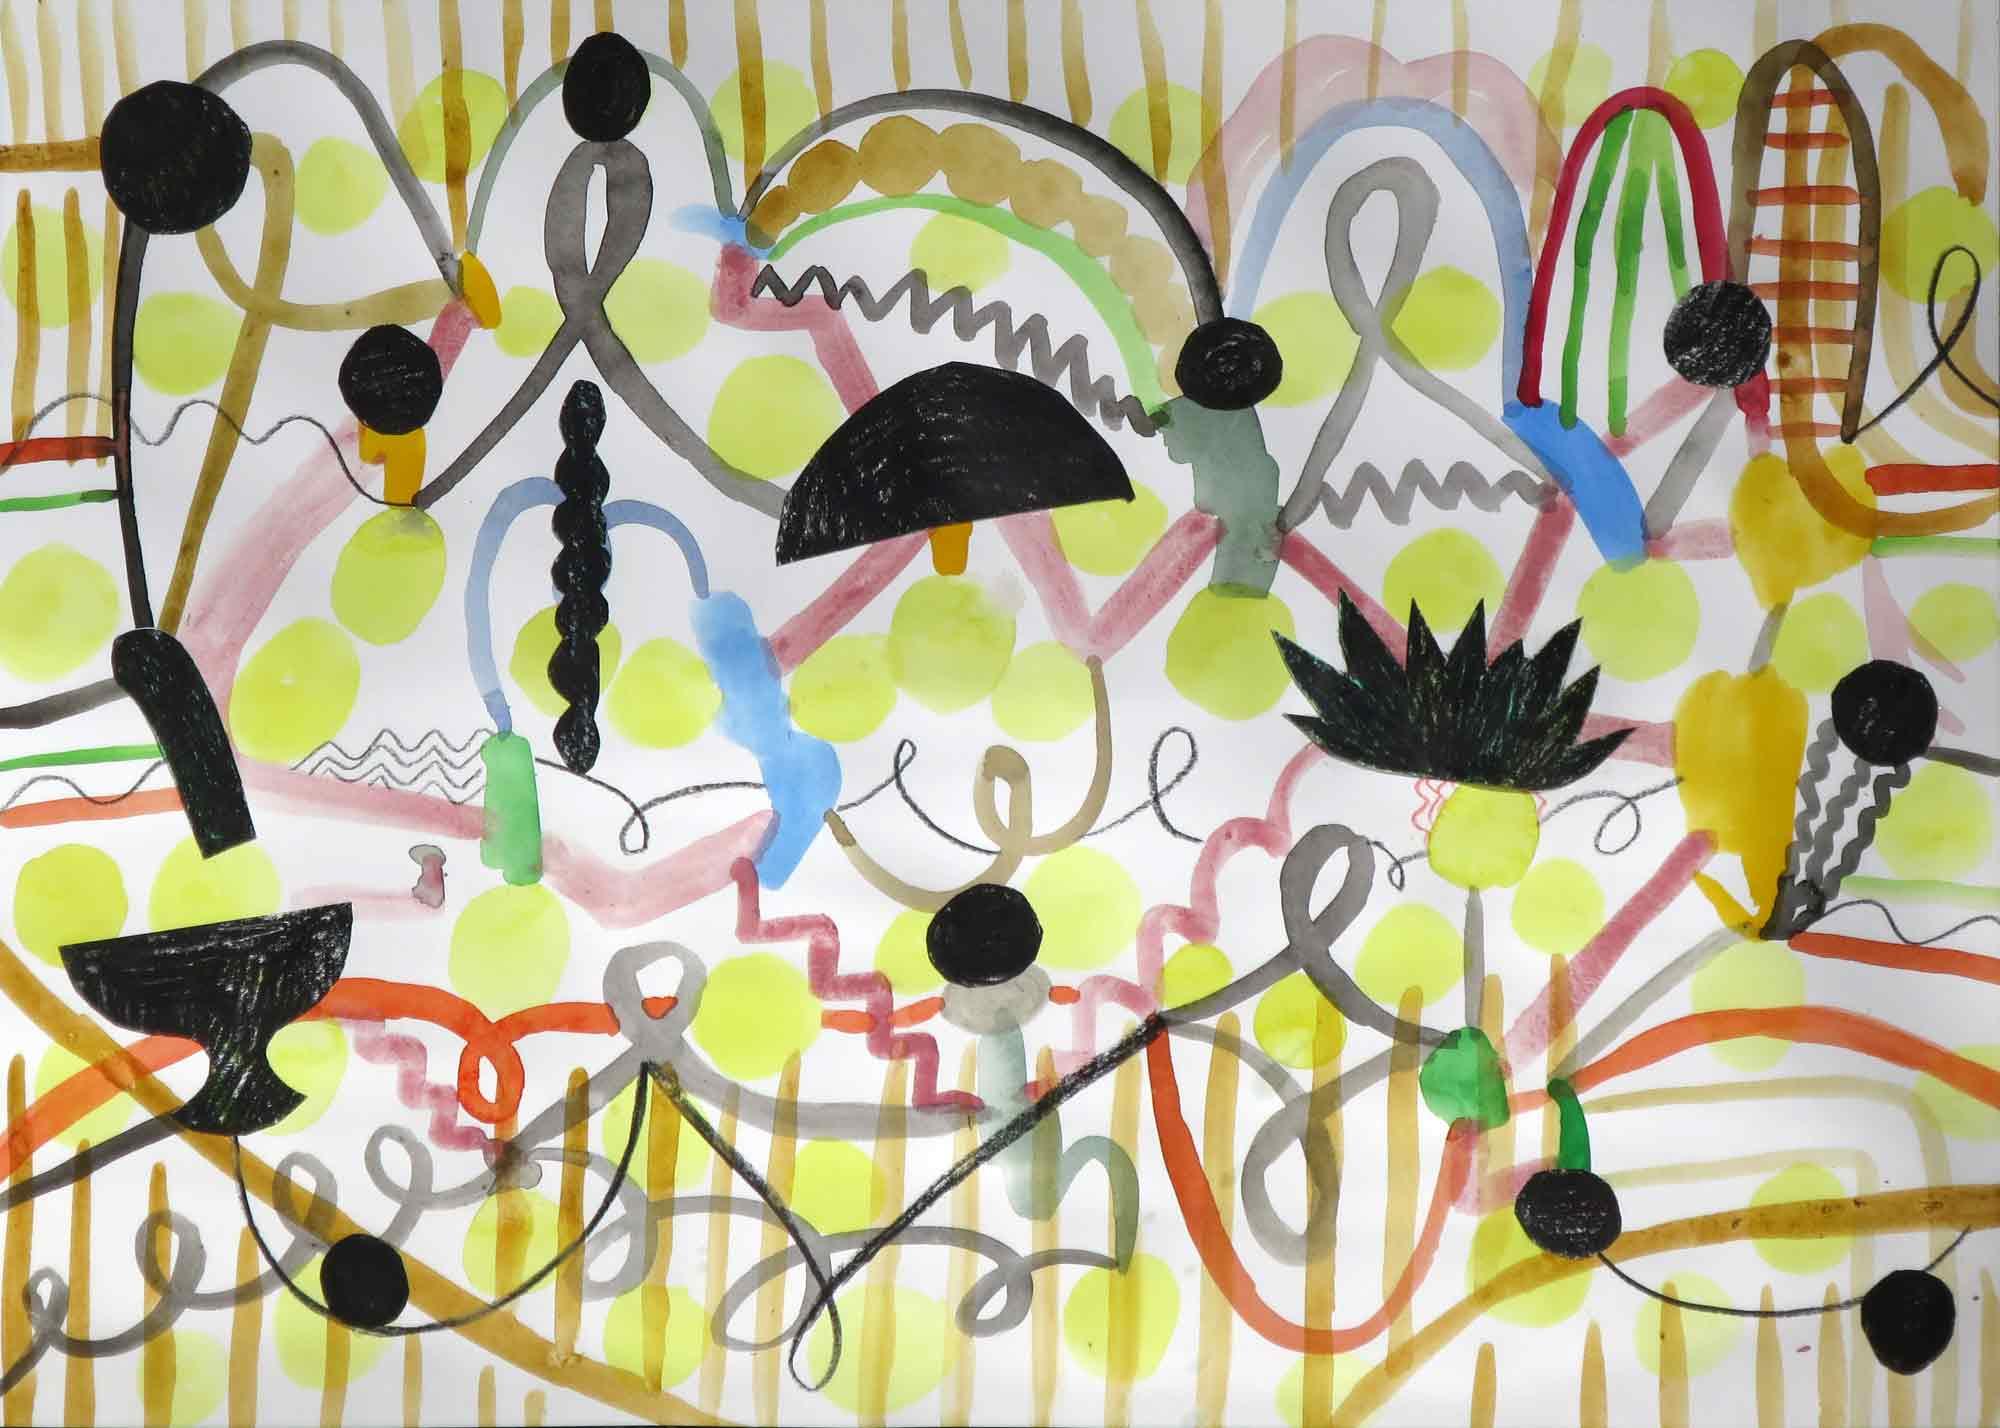 Aan en uit (On and off)  collage; potlood, aquarel, gouache 29 x 42 cm, 2017